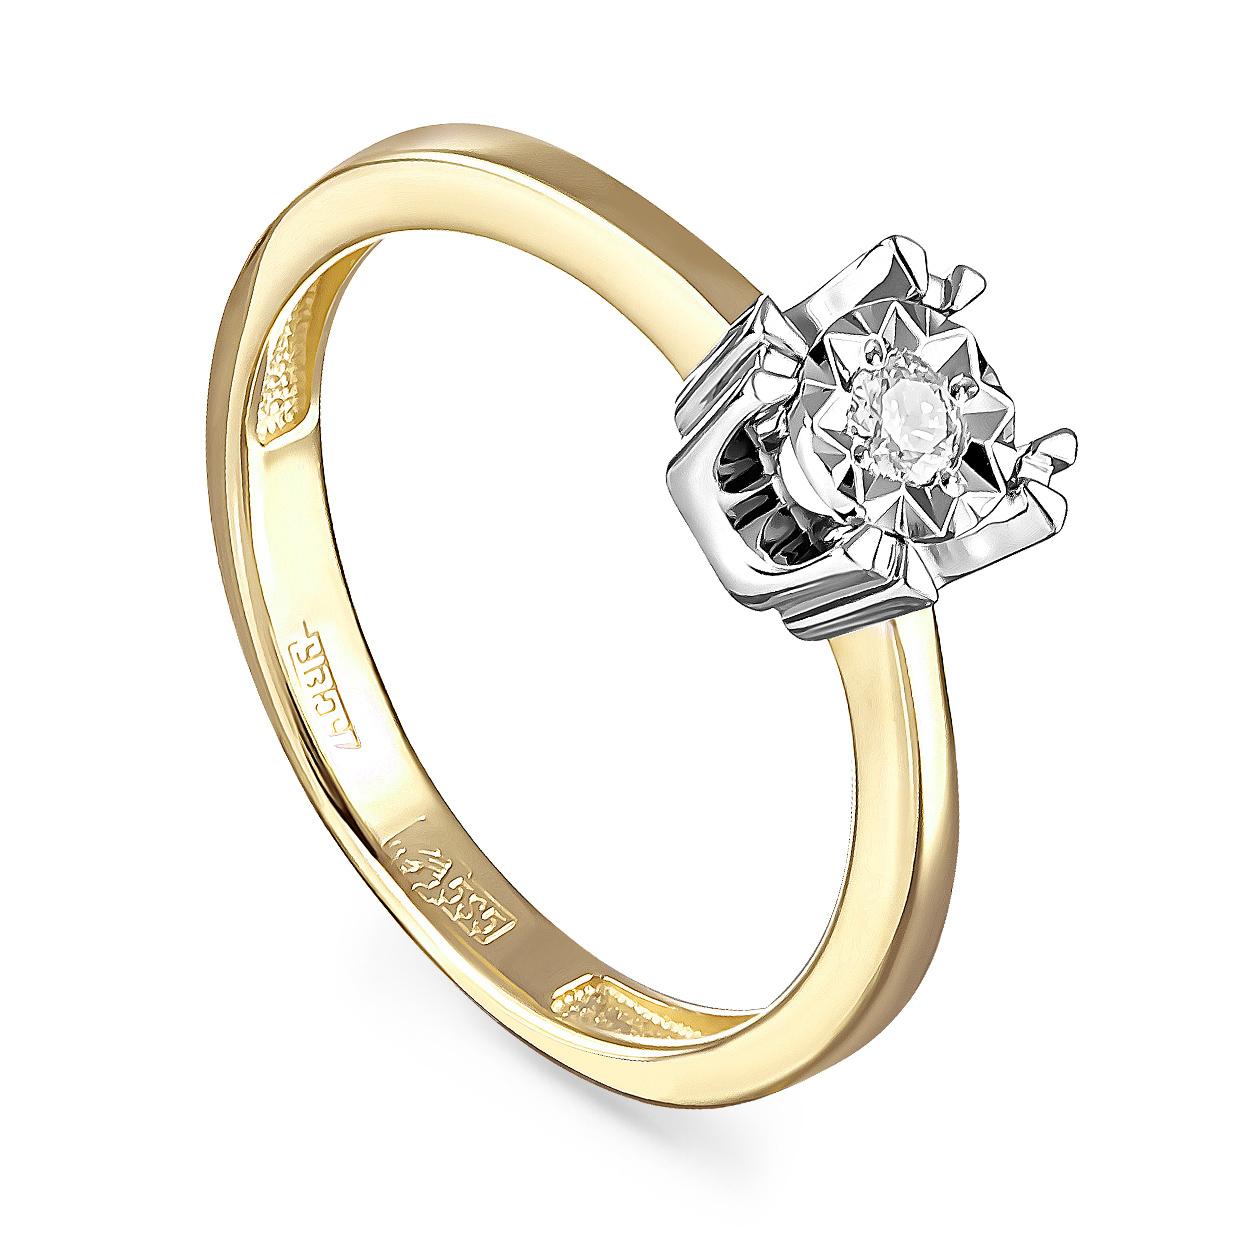 Кольцо из лимонного золота Бриллиант арт. 11-21103-1000 11-21103-1000